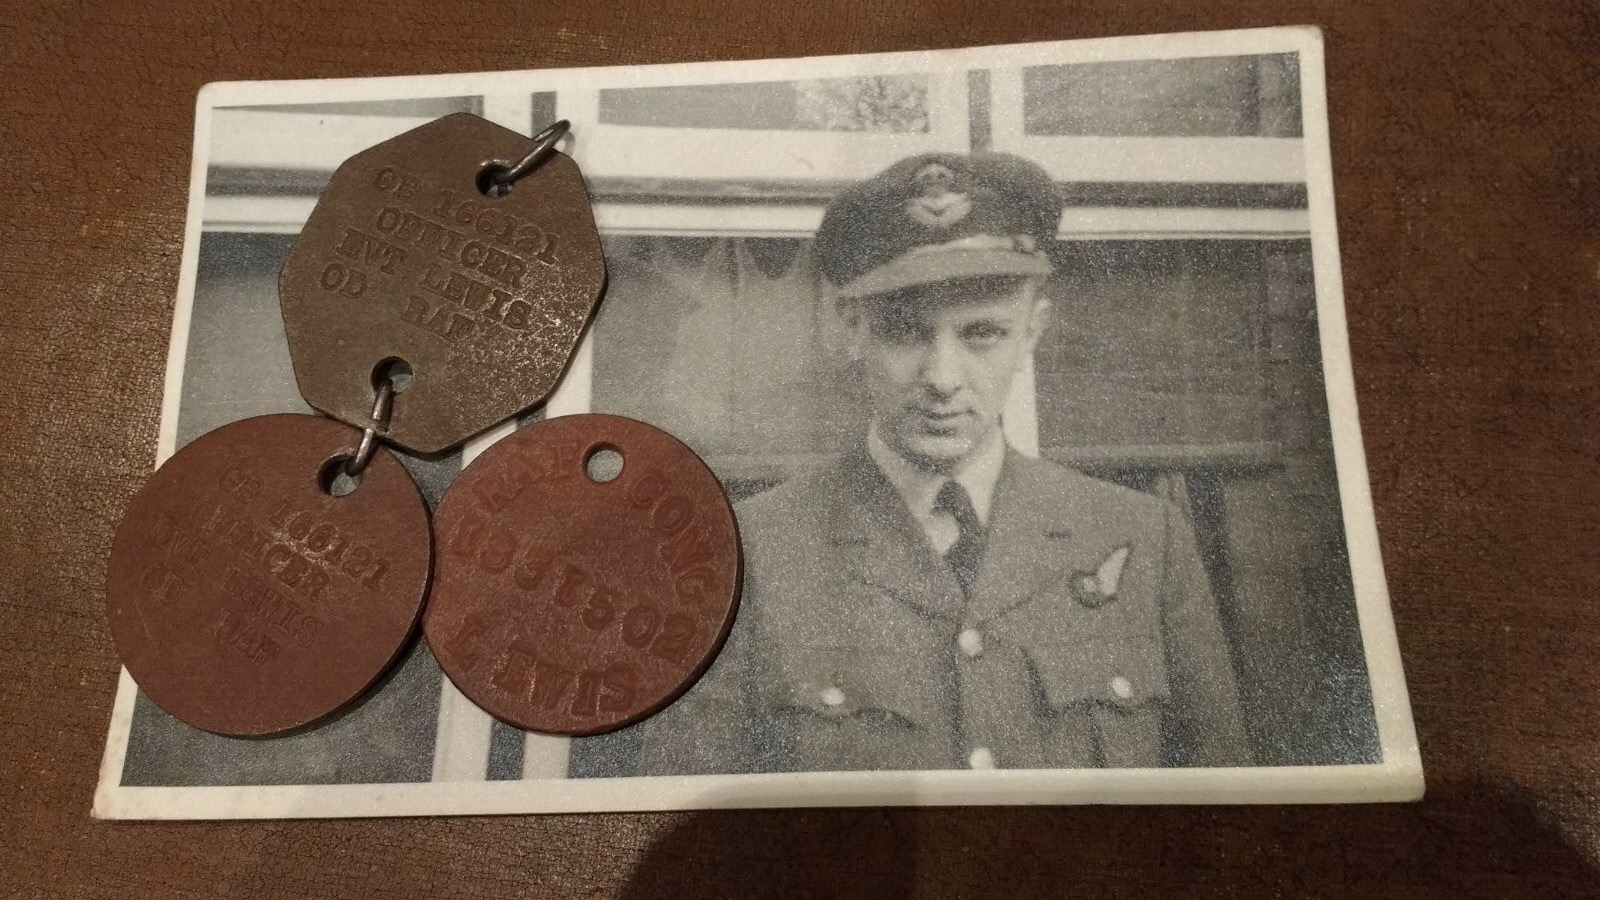 WW2 Spitfire Pilot's Gun Camera And Memorabilia (Multiple Images 1 of 31) - Image 30 of 31